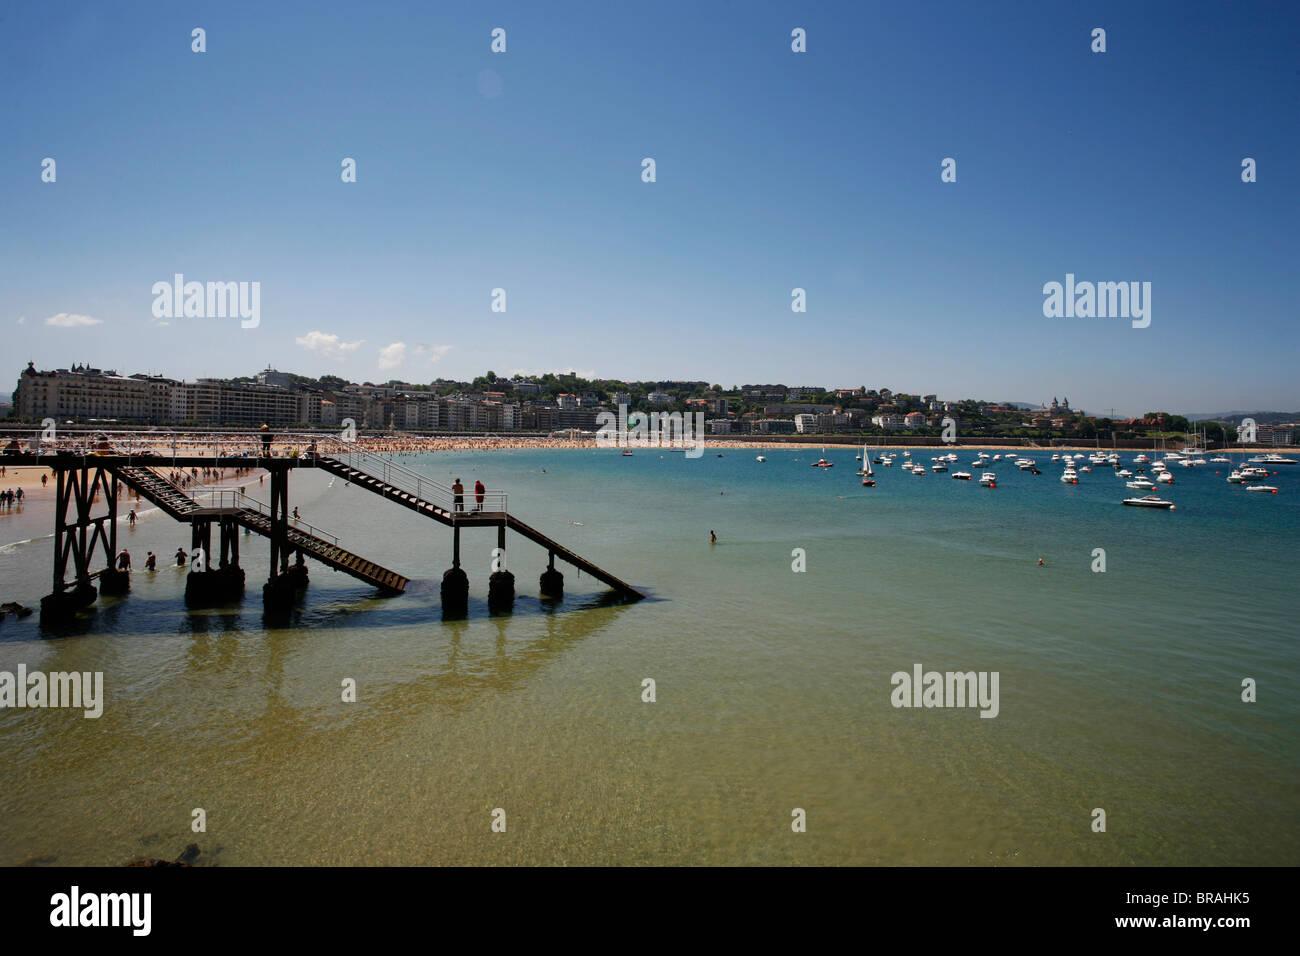 Concha bay, San Sebastian, Pays Basque, Euskadi, Spain, Europe - Stock Image